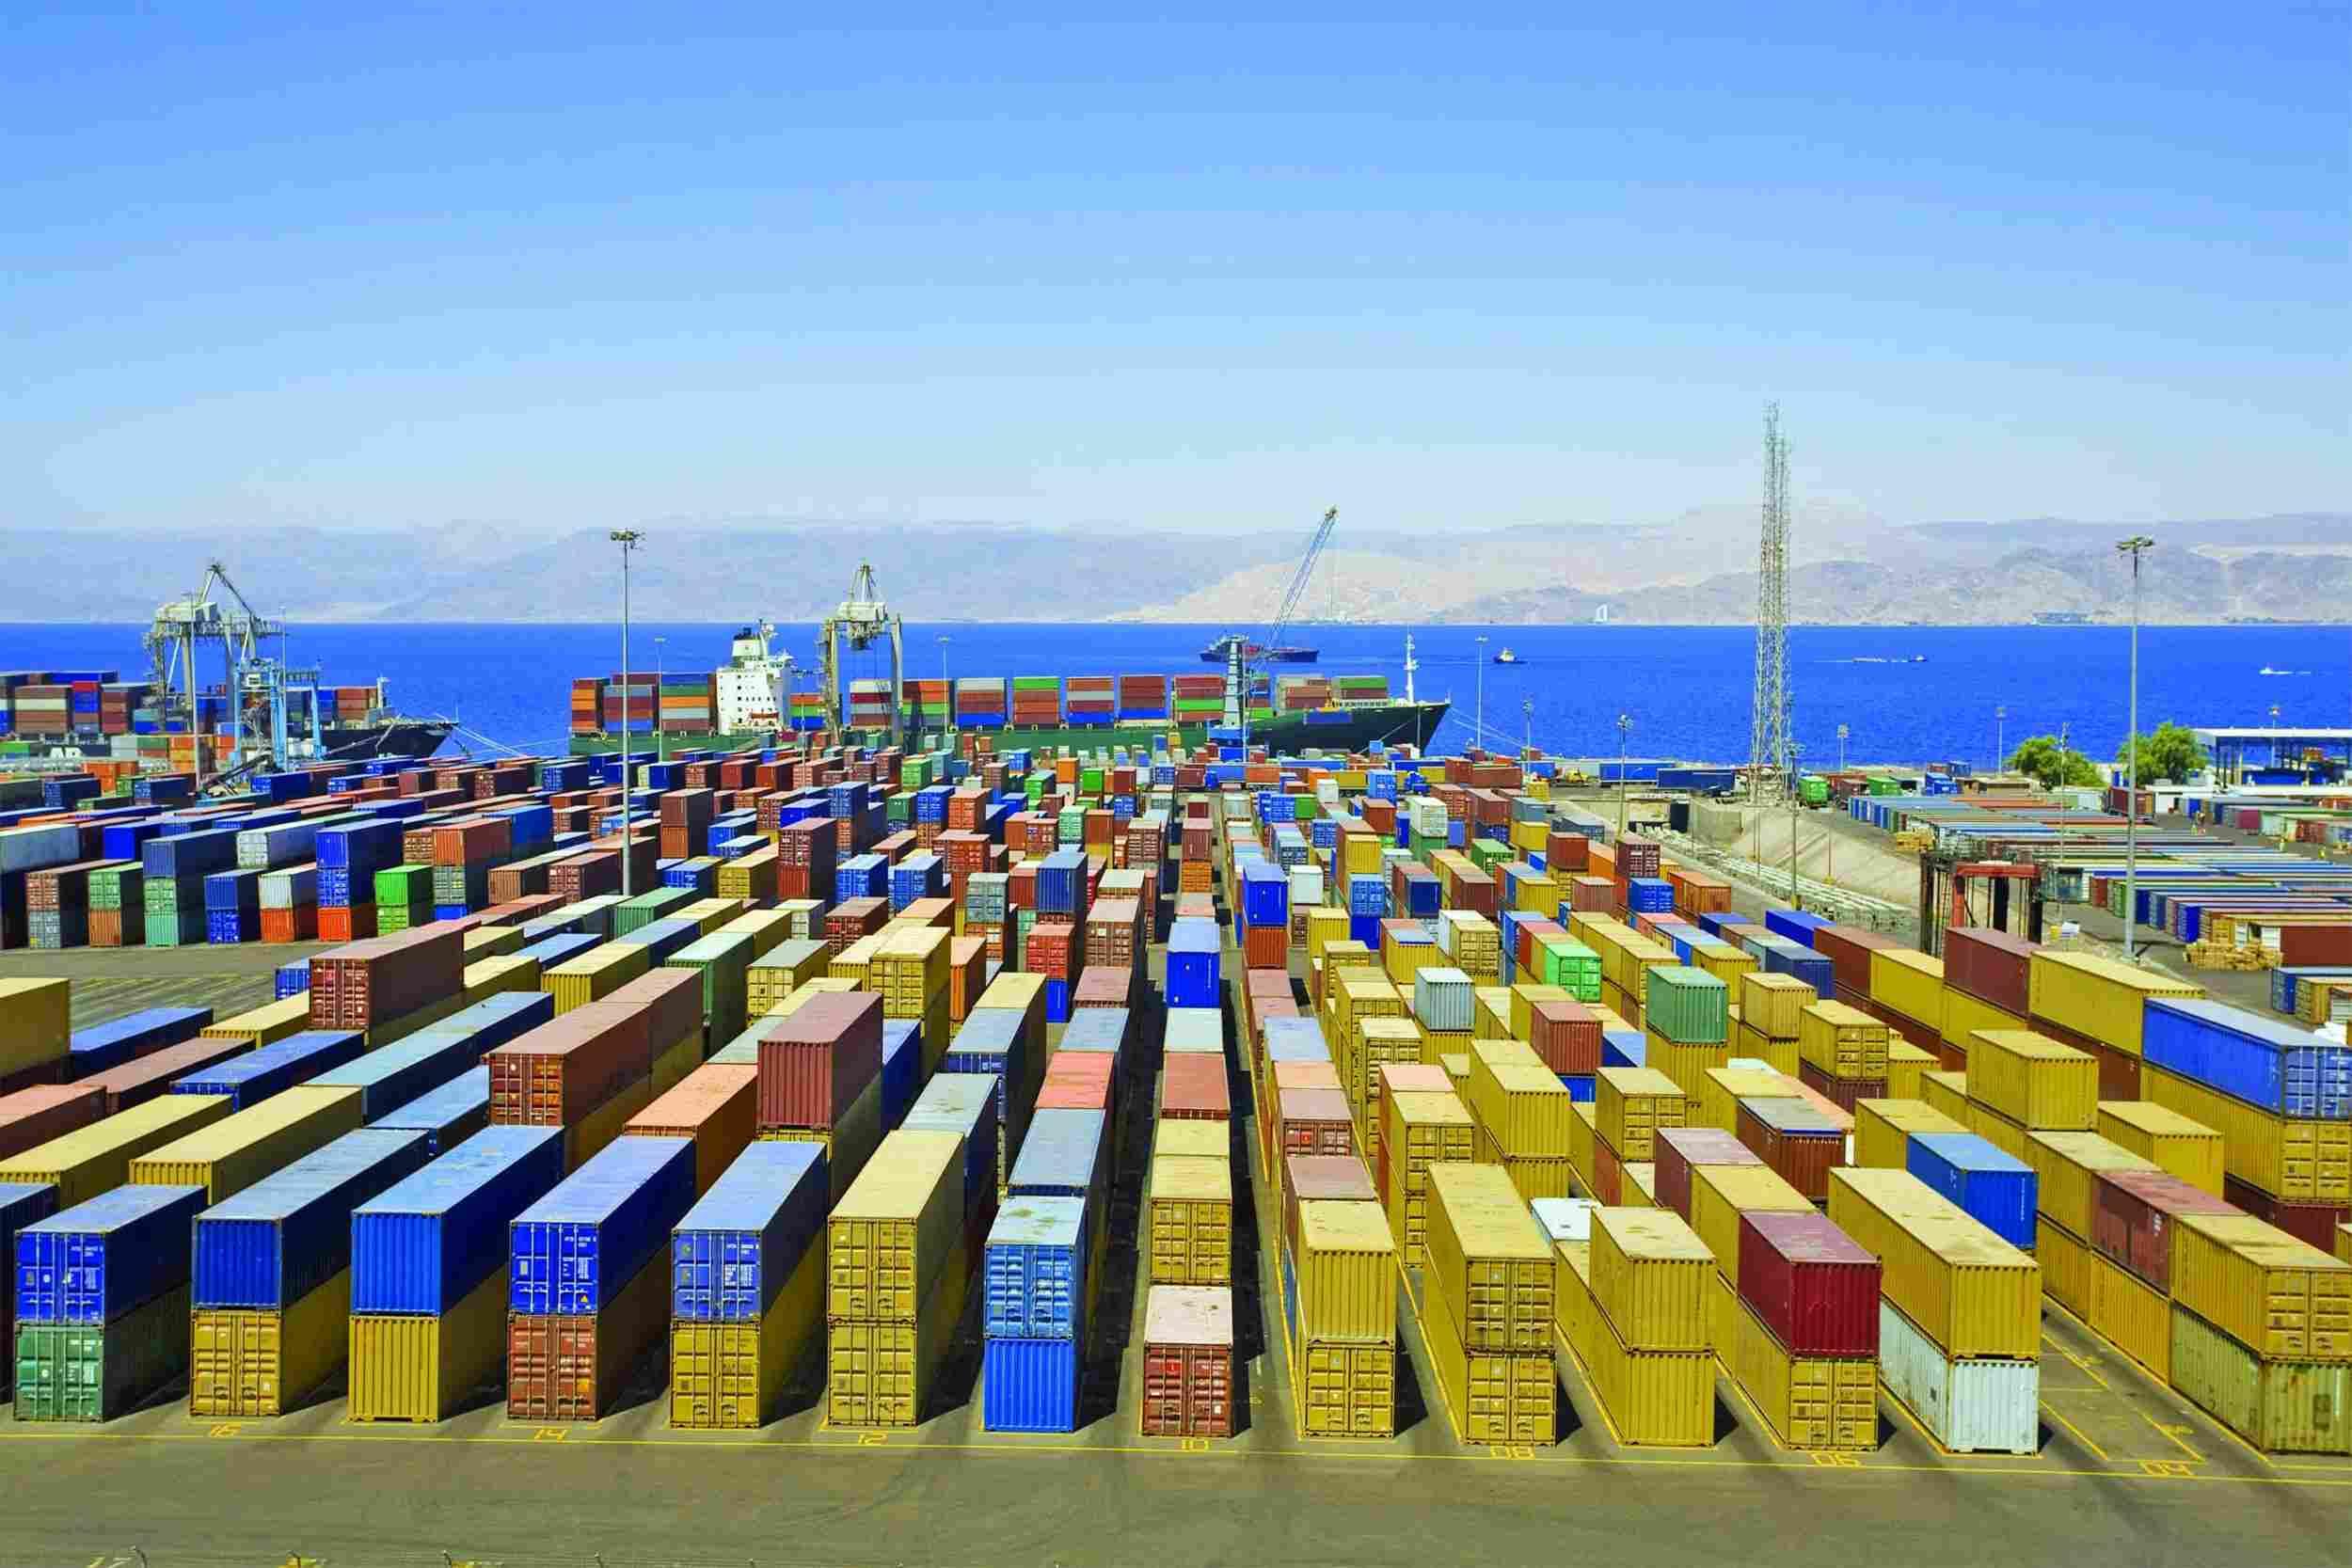 http://www.palletizedtrucking.com/wp-content/uploads/2015/09/Harbor-warehouse.jpg